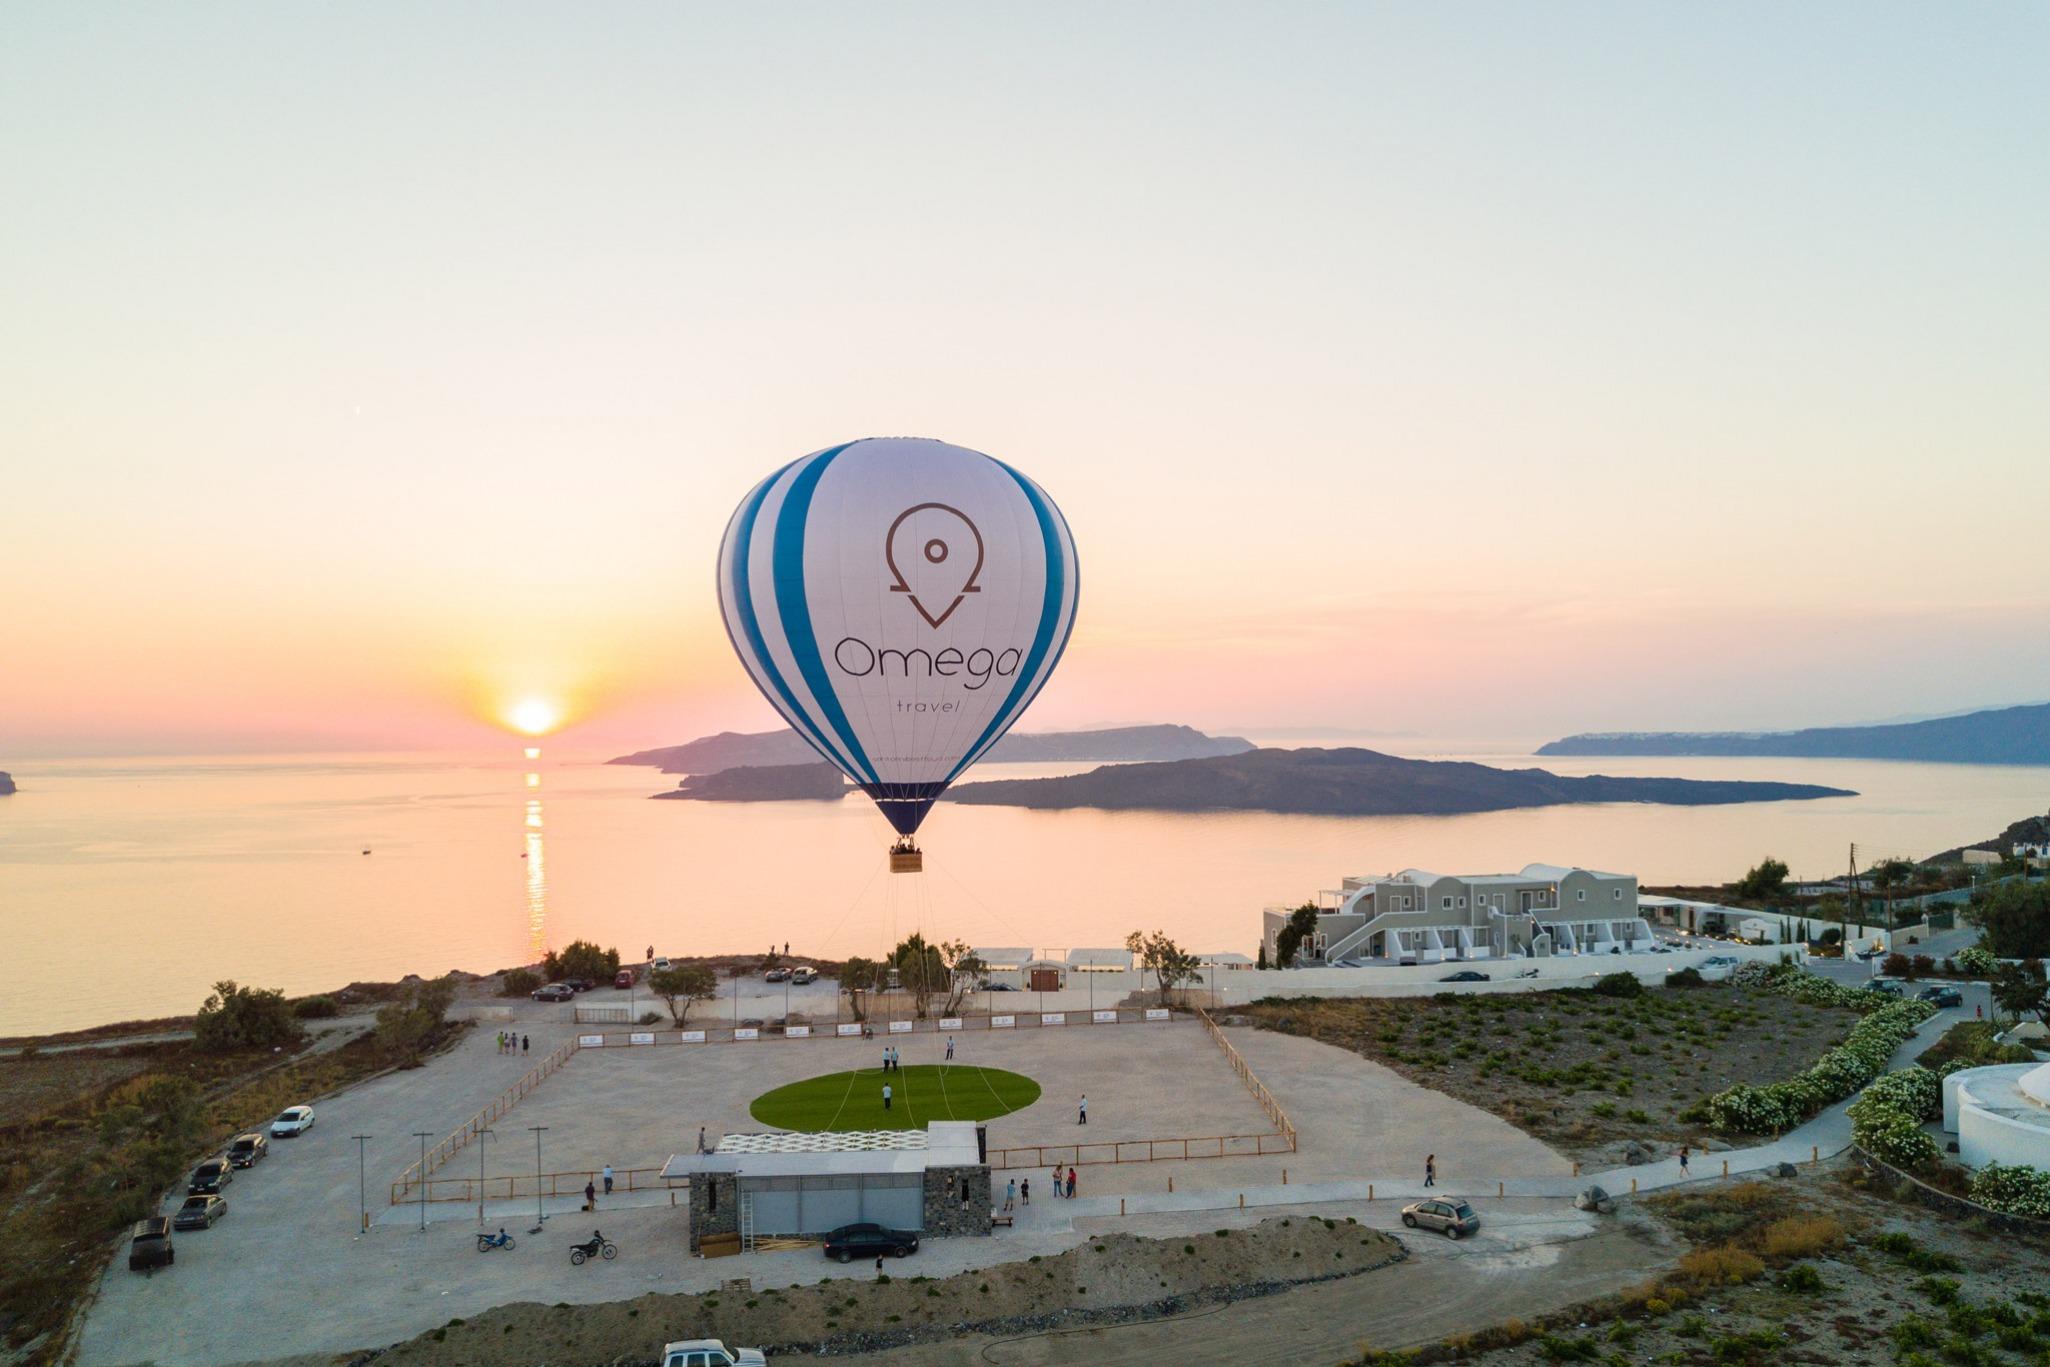 hot-air-balloon-ride-caldera-view-santorini